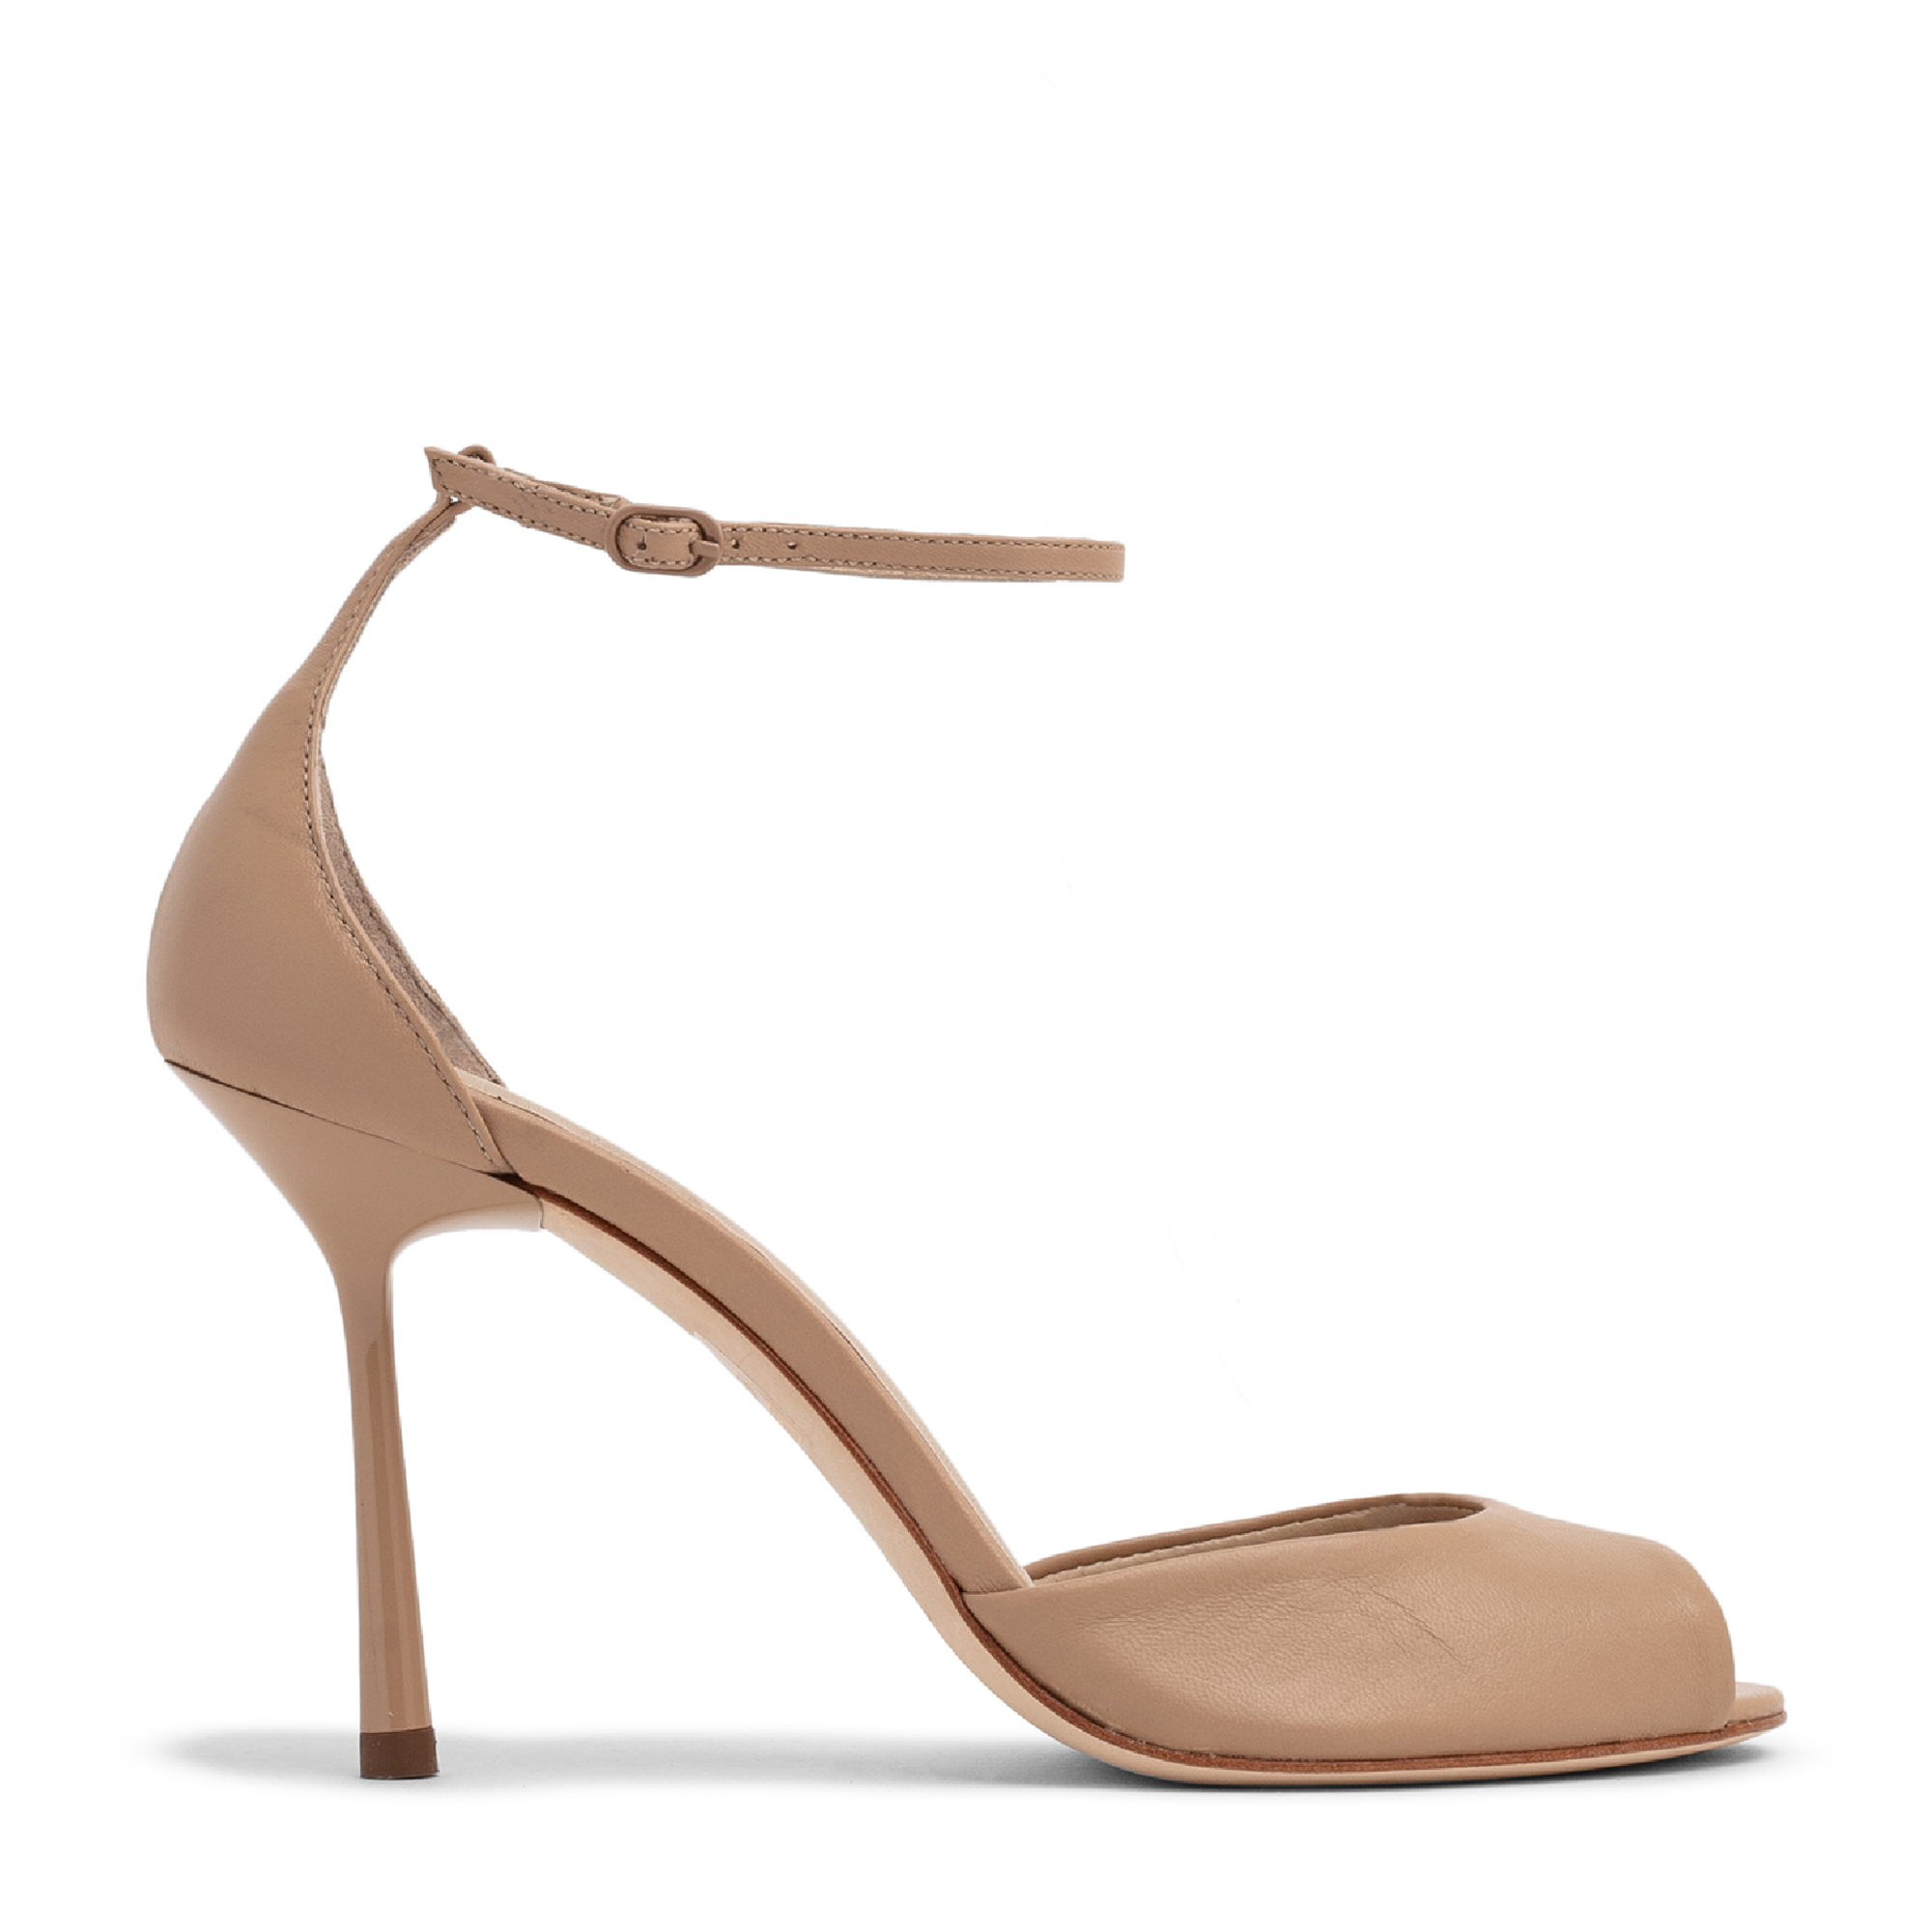 Spindle 90 sandals